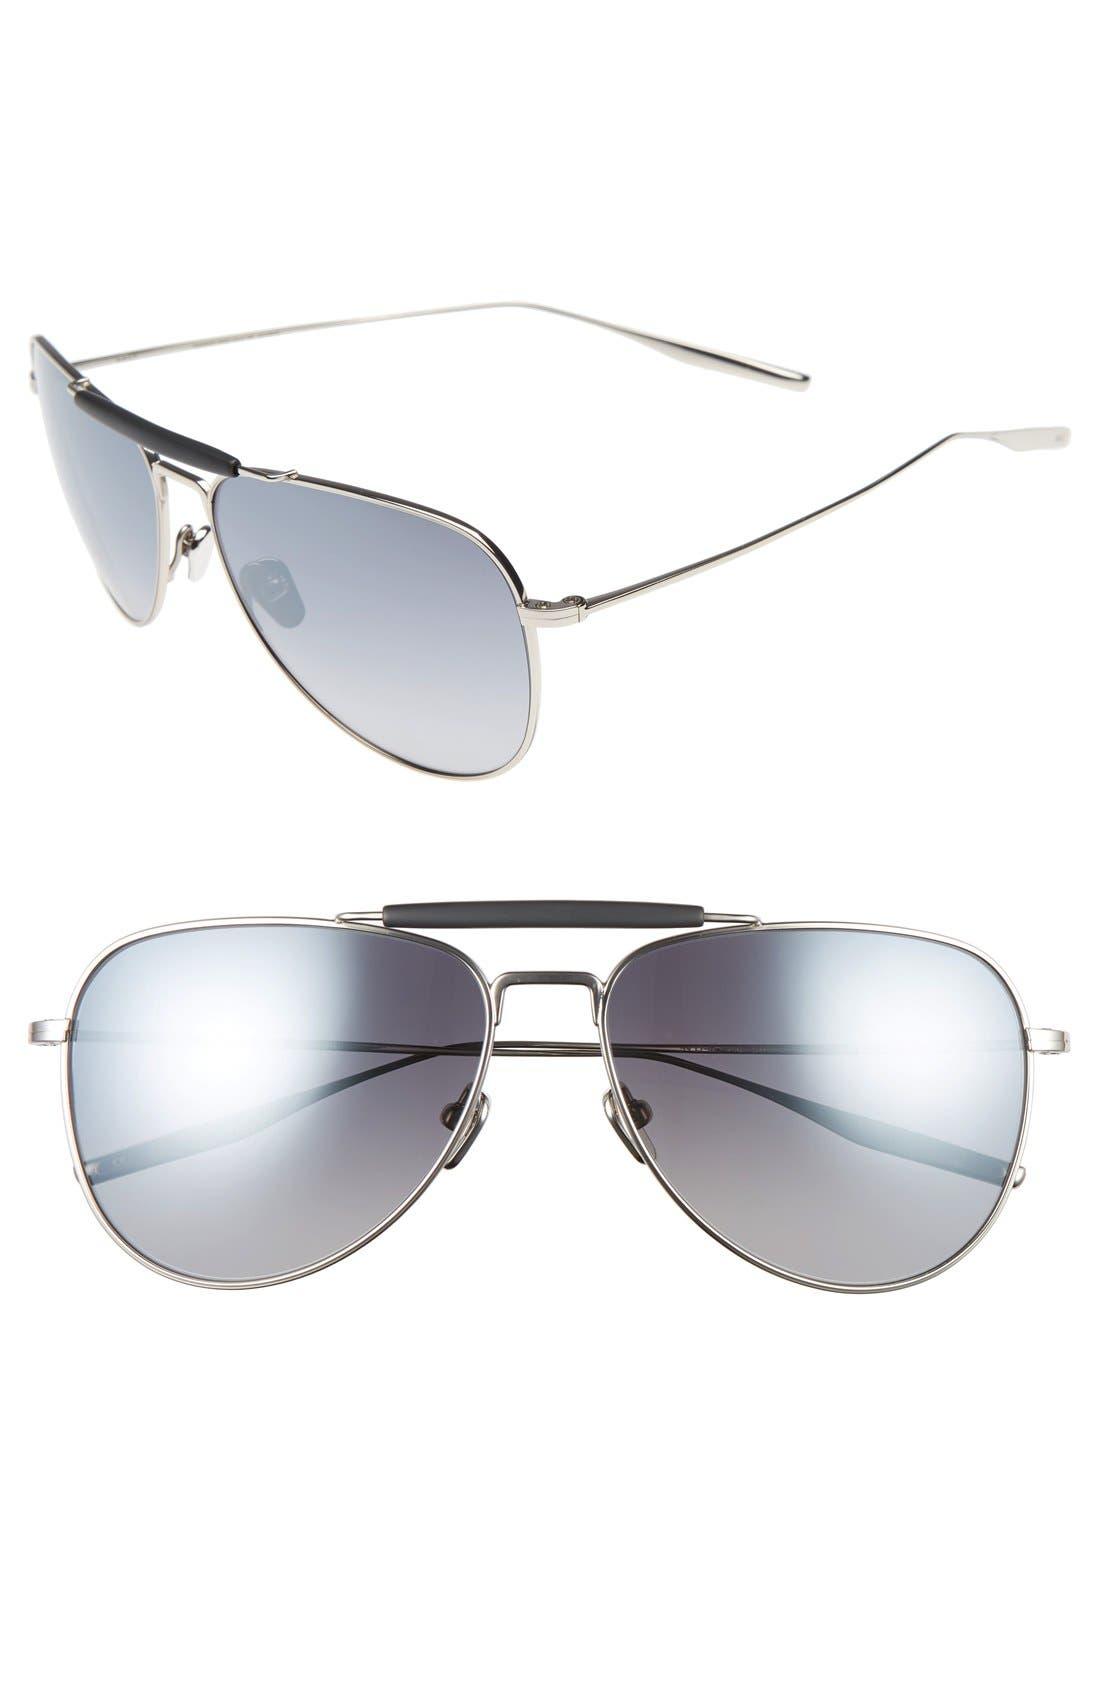 Striker 59mm Aviator Sunglasses,                             Main thumbnail 1, color,                             TRADITIONAL SILVER